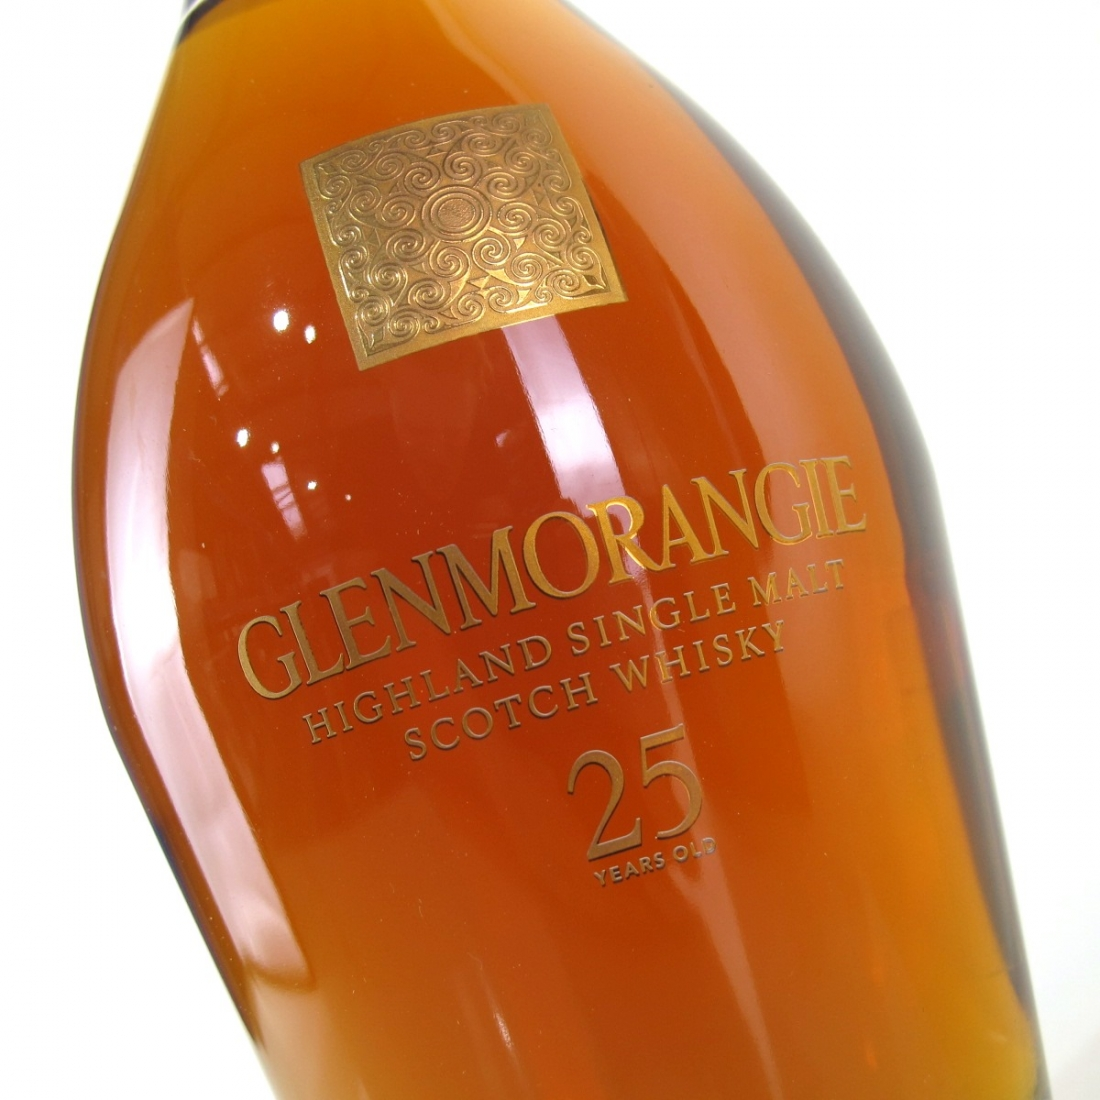 Glenmorangie 25 Year Old Quarter Century